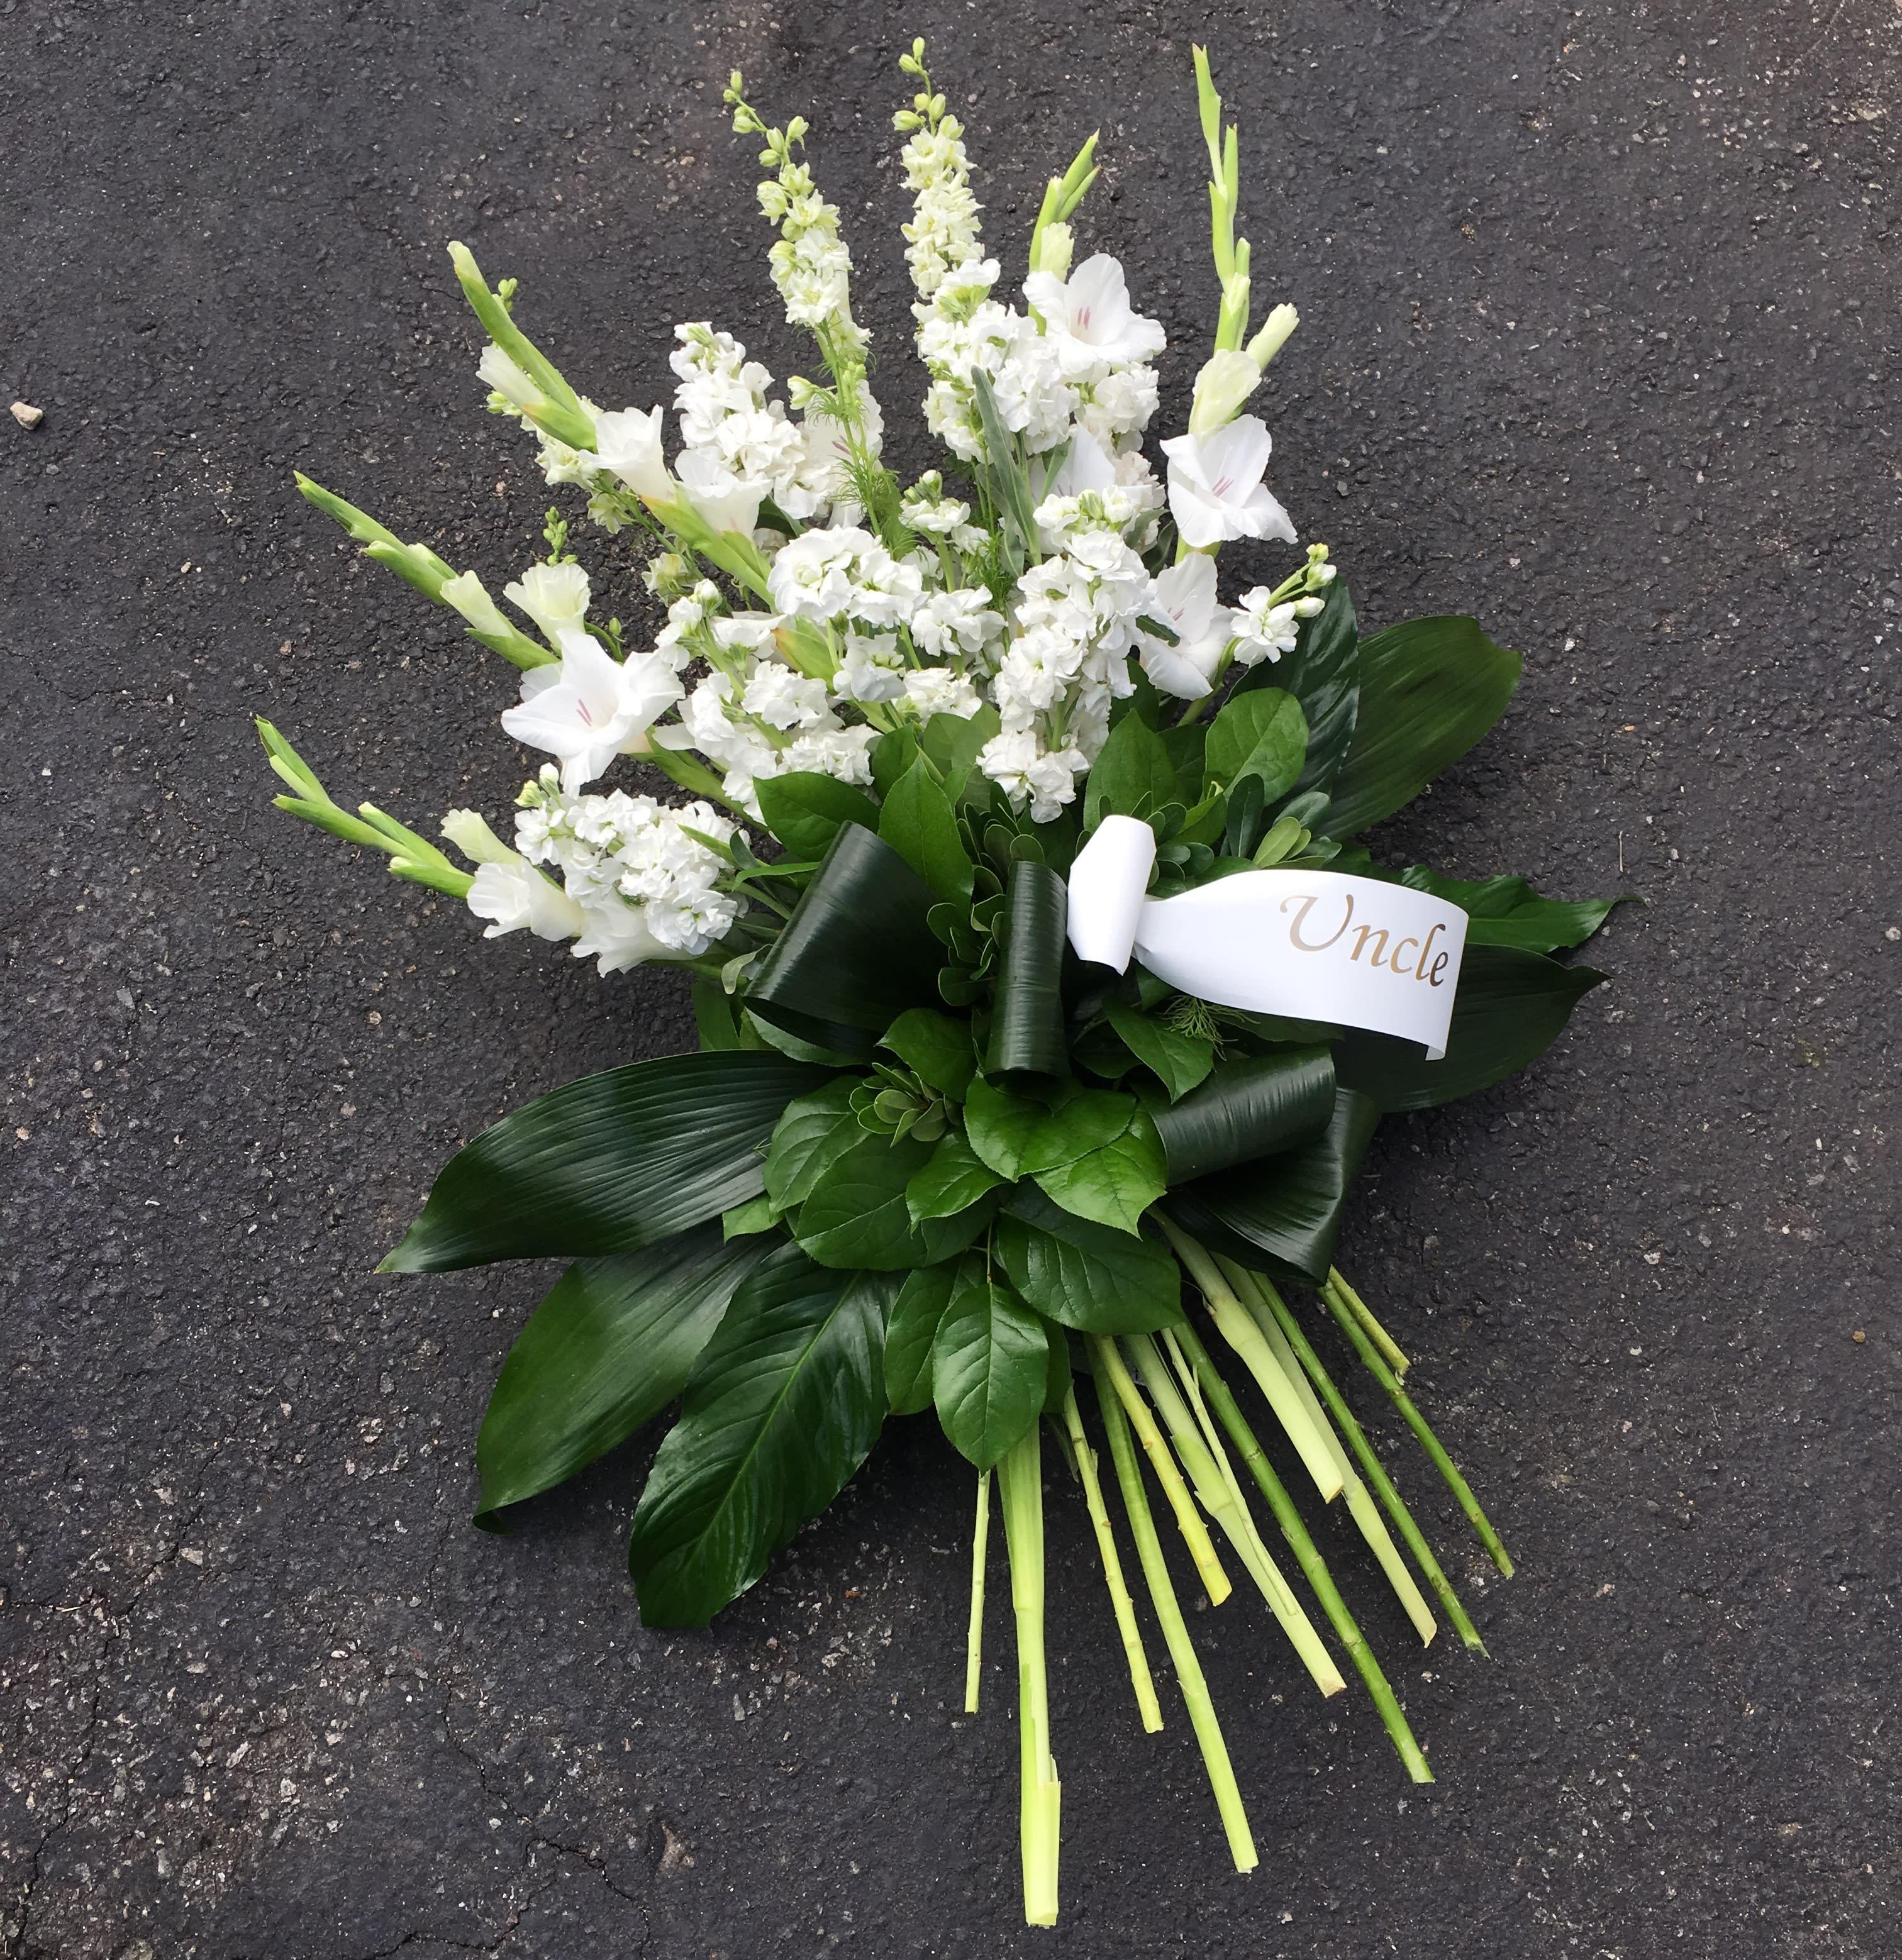 Evans White Elegance Tribute Funeral Spray in Peabody, MA   Evans Flowers